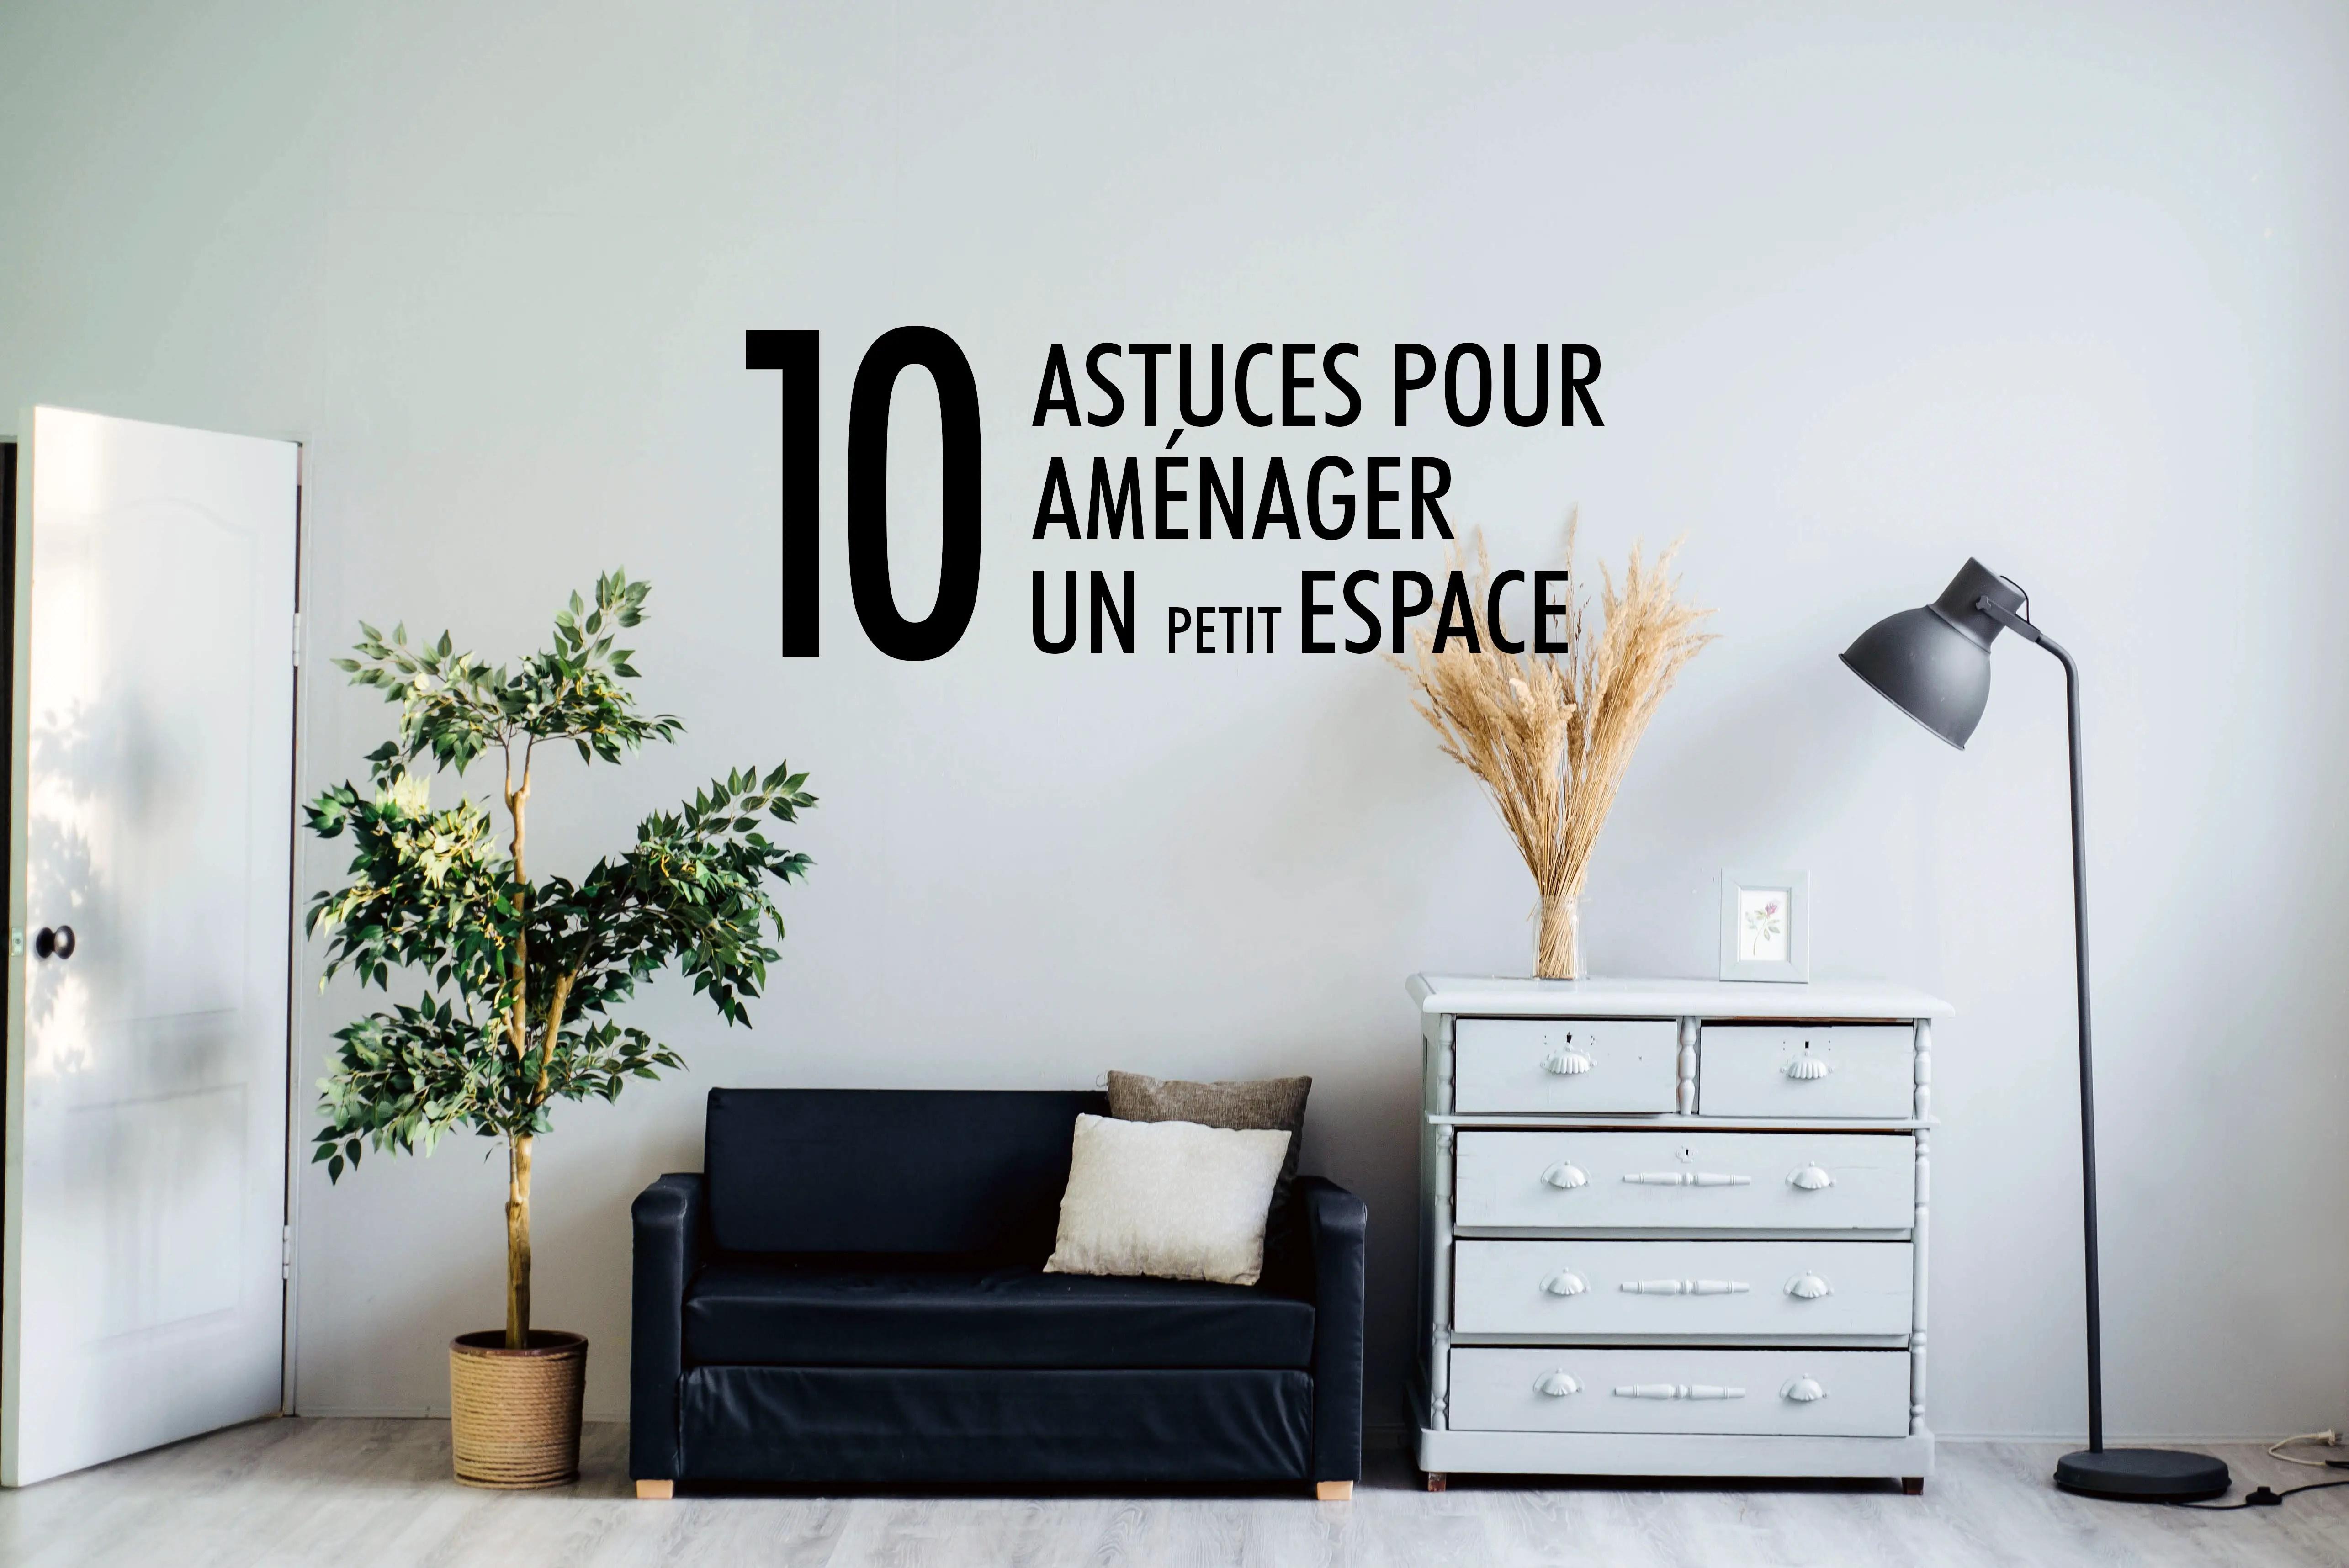 Amenagement Petit Espace Les 10 Astuces Lilm